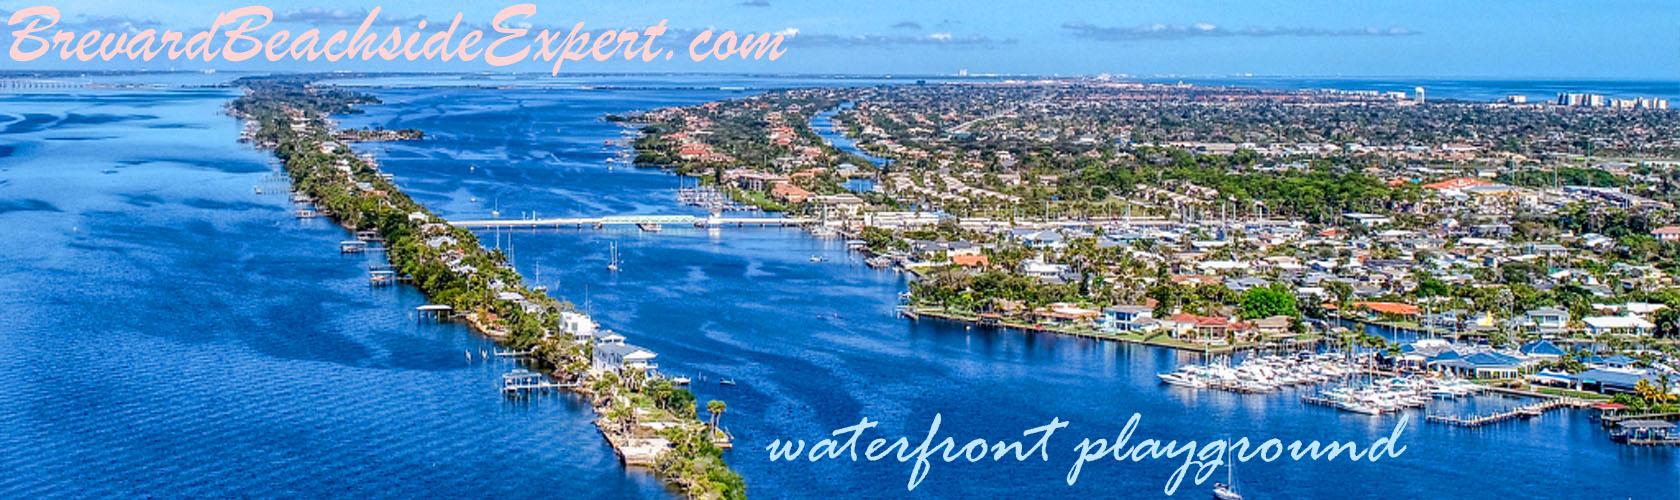 Dragon Point Merrit Island Florida Aerial Banner